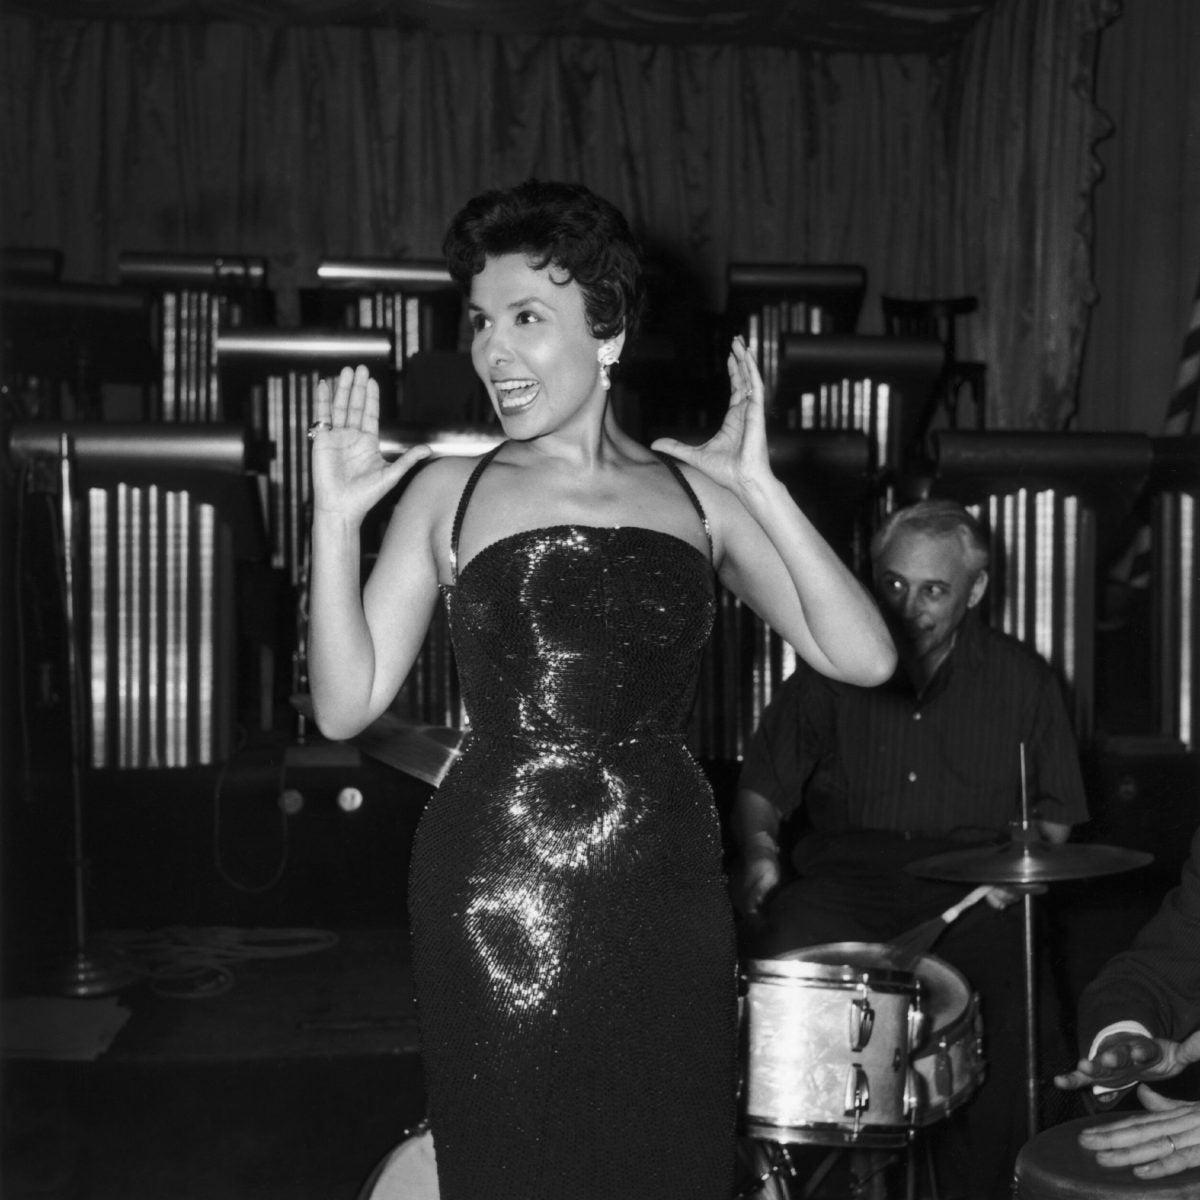 Paris, Singer Lena Horne, 1956